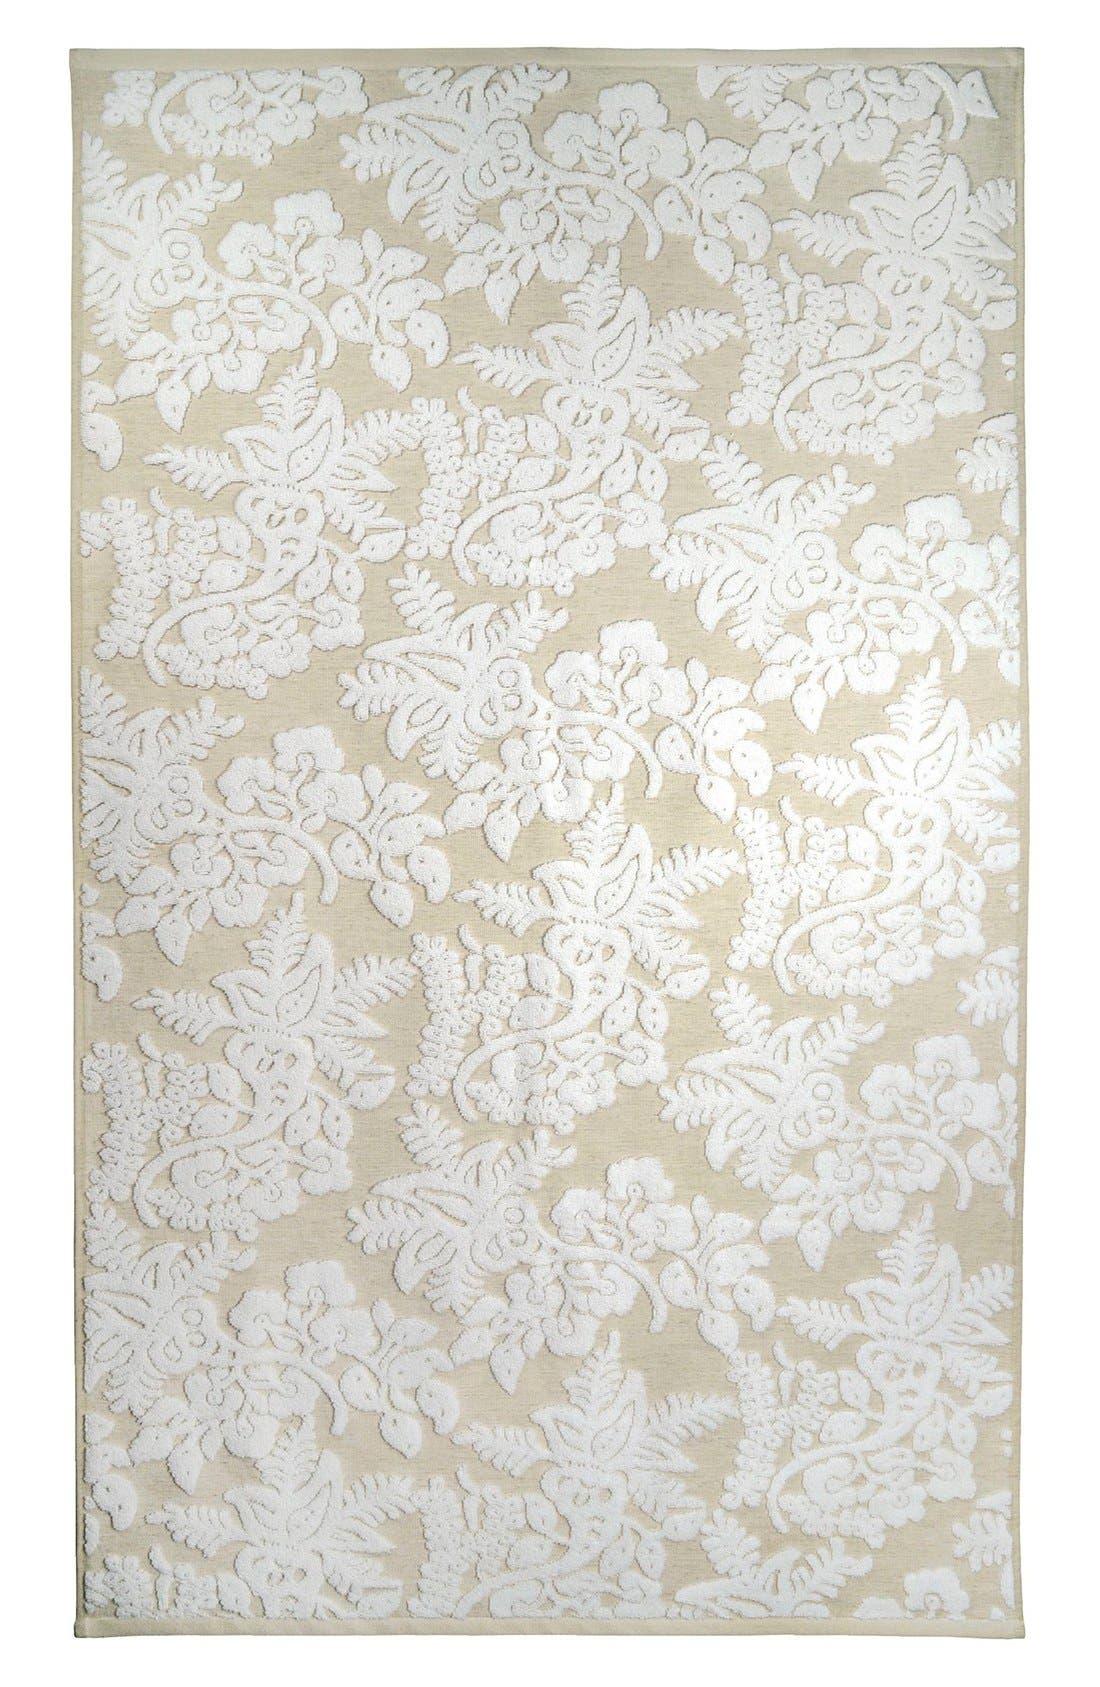 'Pasak' Bath Towel,                             Main thumbnail 1, color,                             Linen/ White